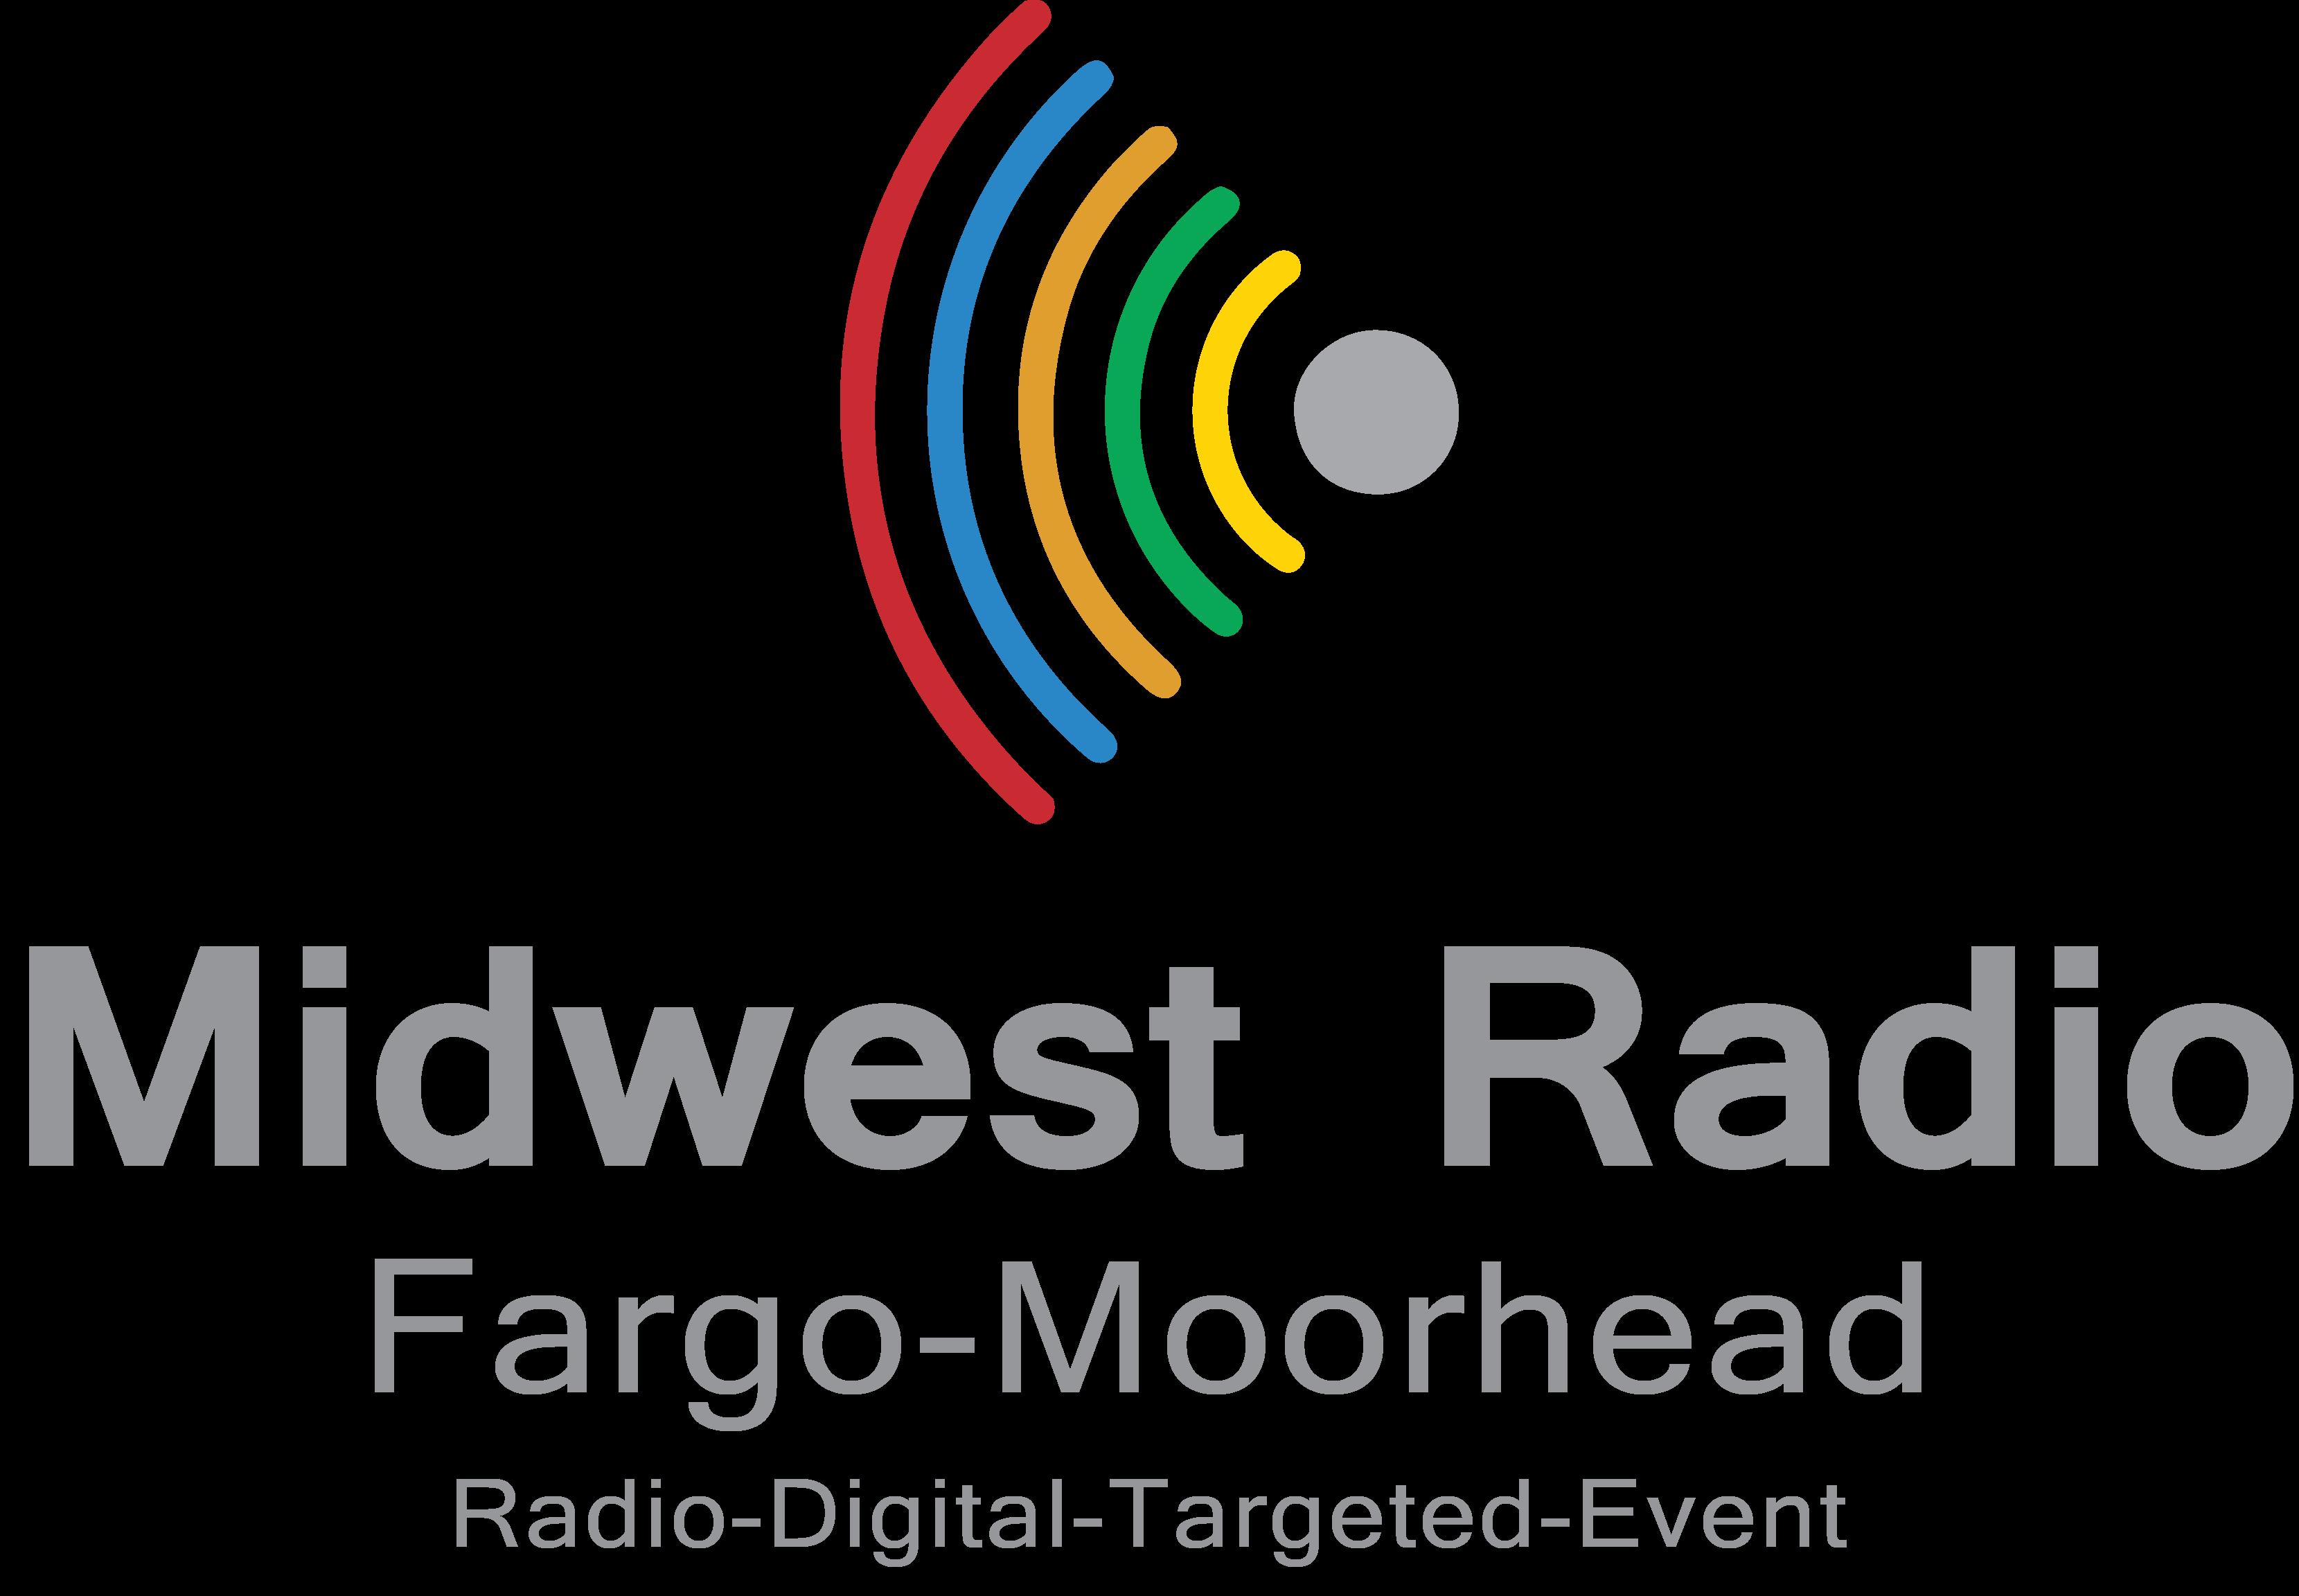 MidwestRadio_RadioDigitalTargetedEvent_Logo